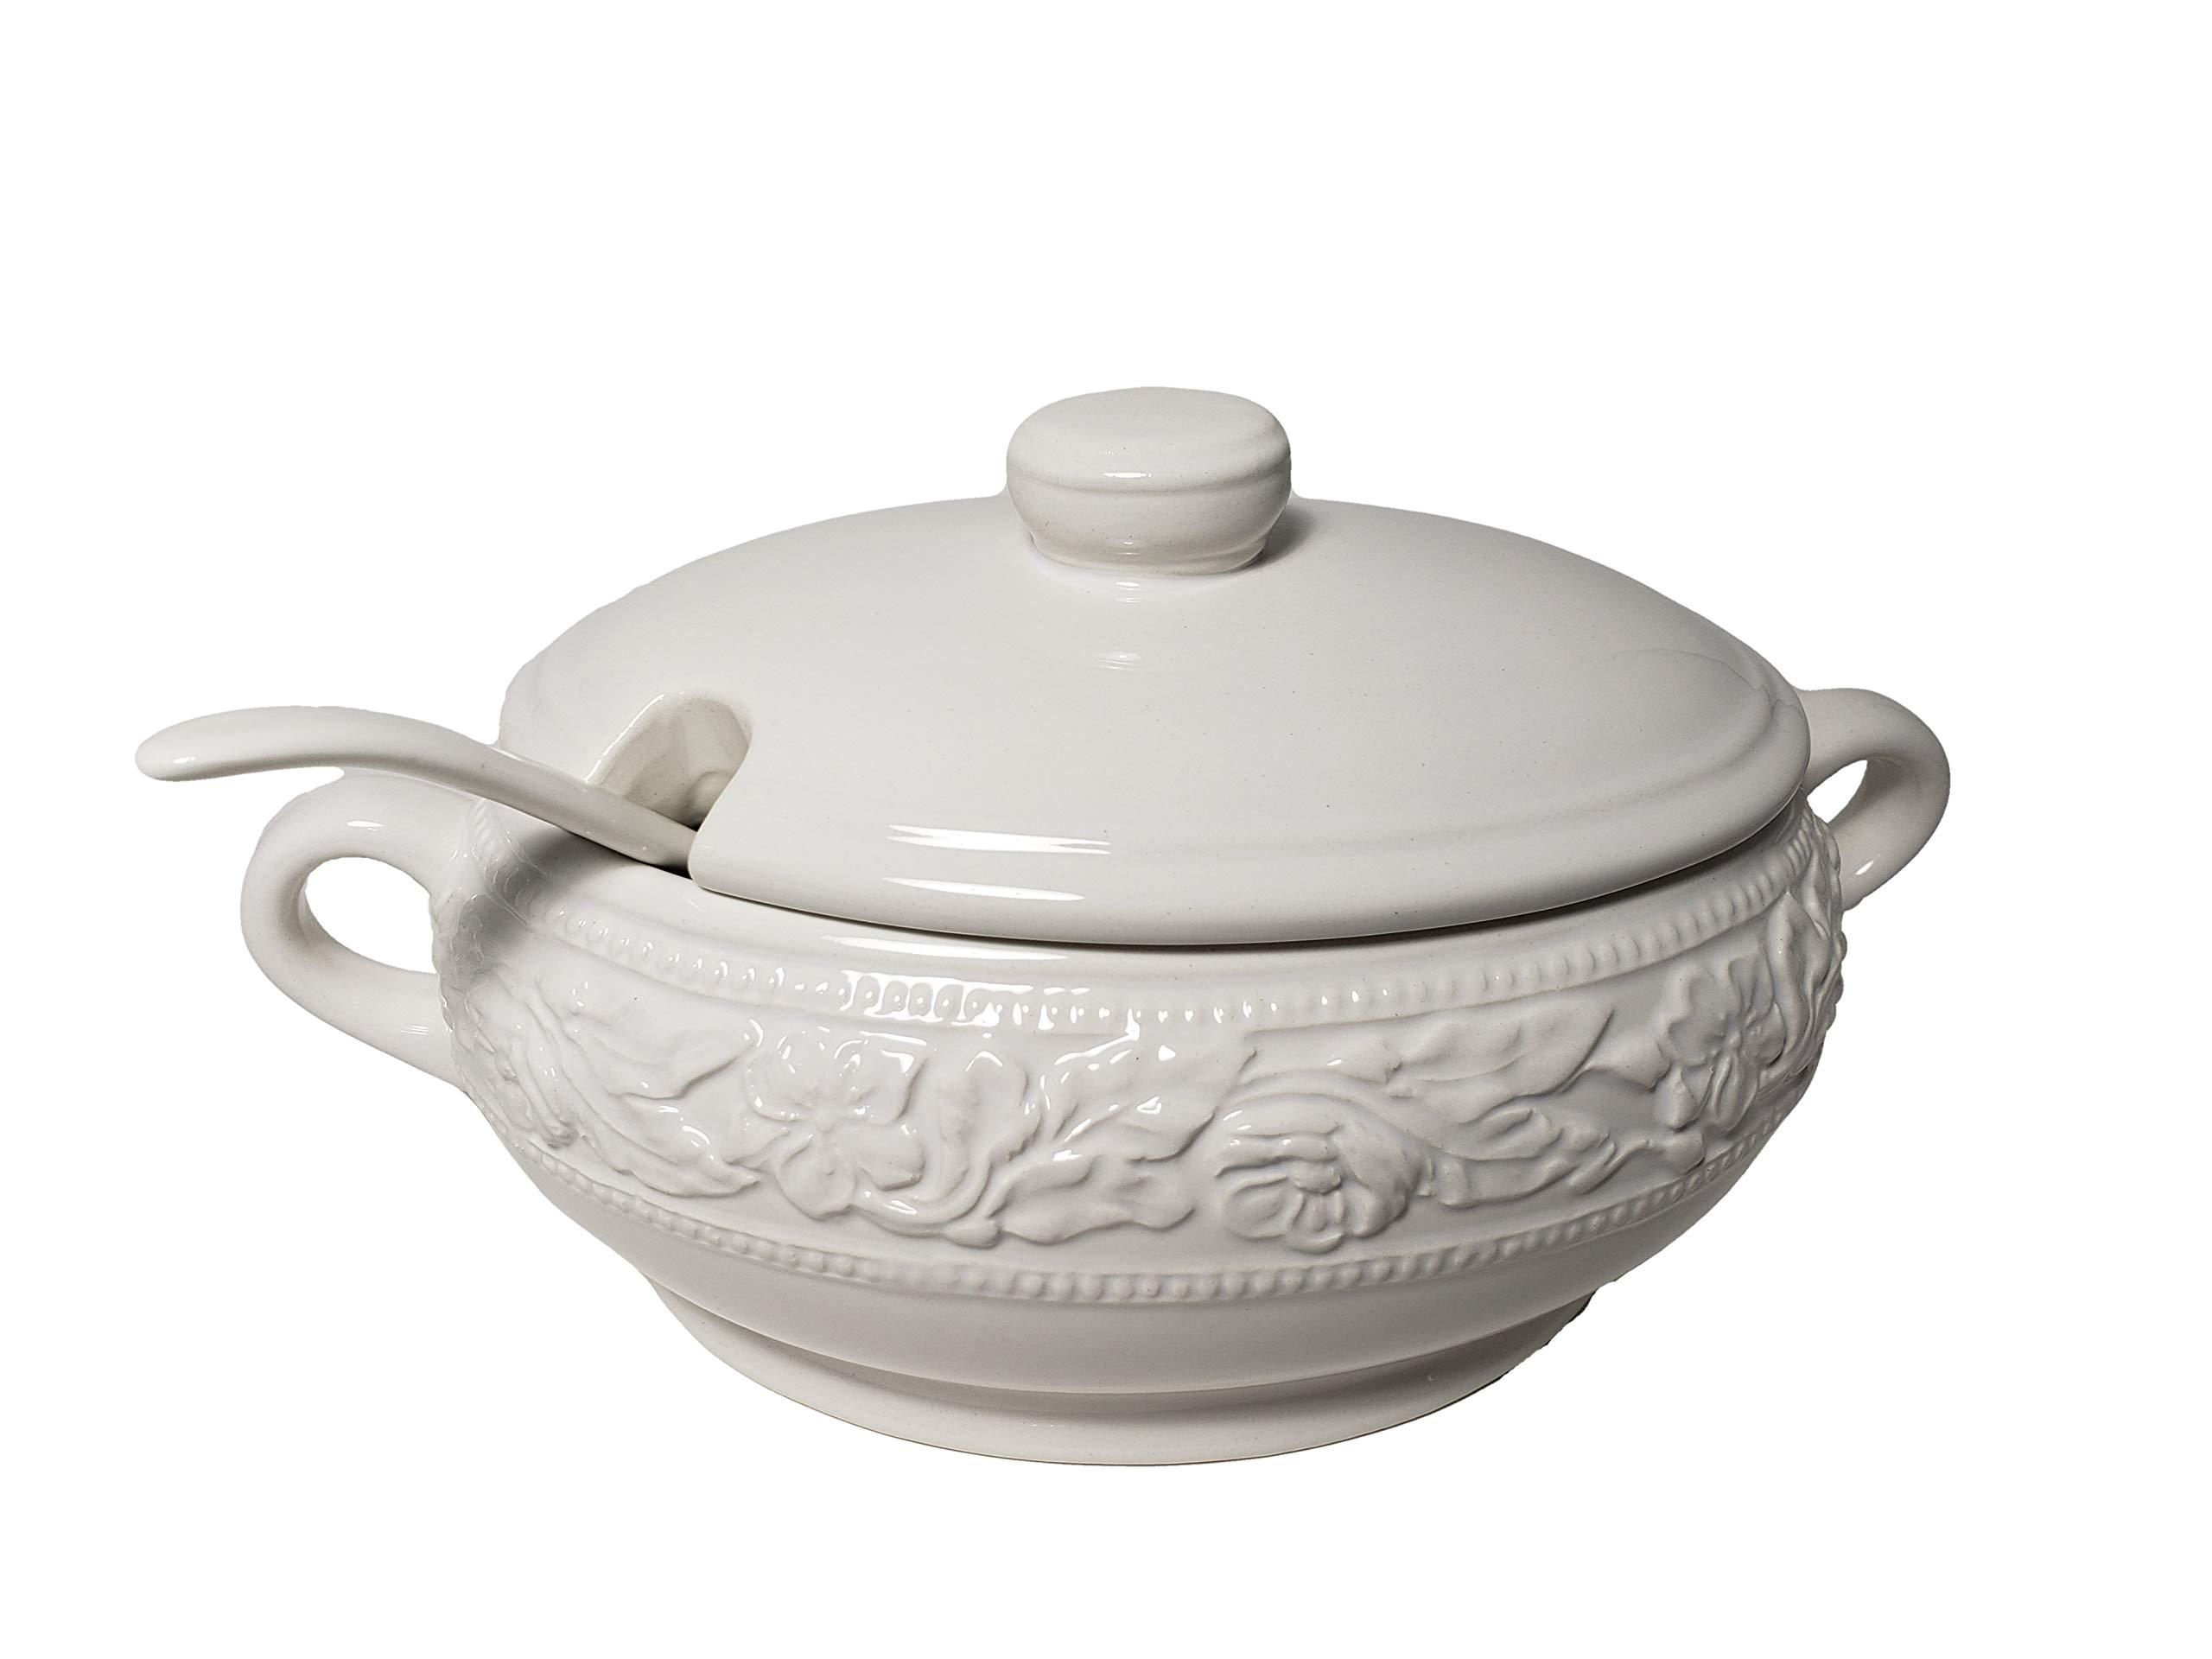 Dolomite Soup Tureen with Ladle 67.6 oz